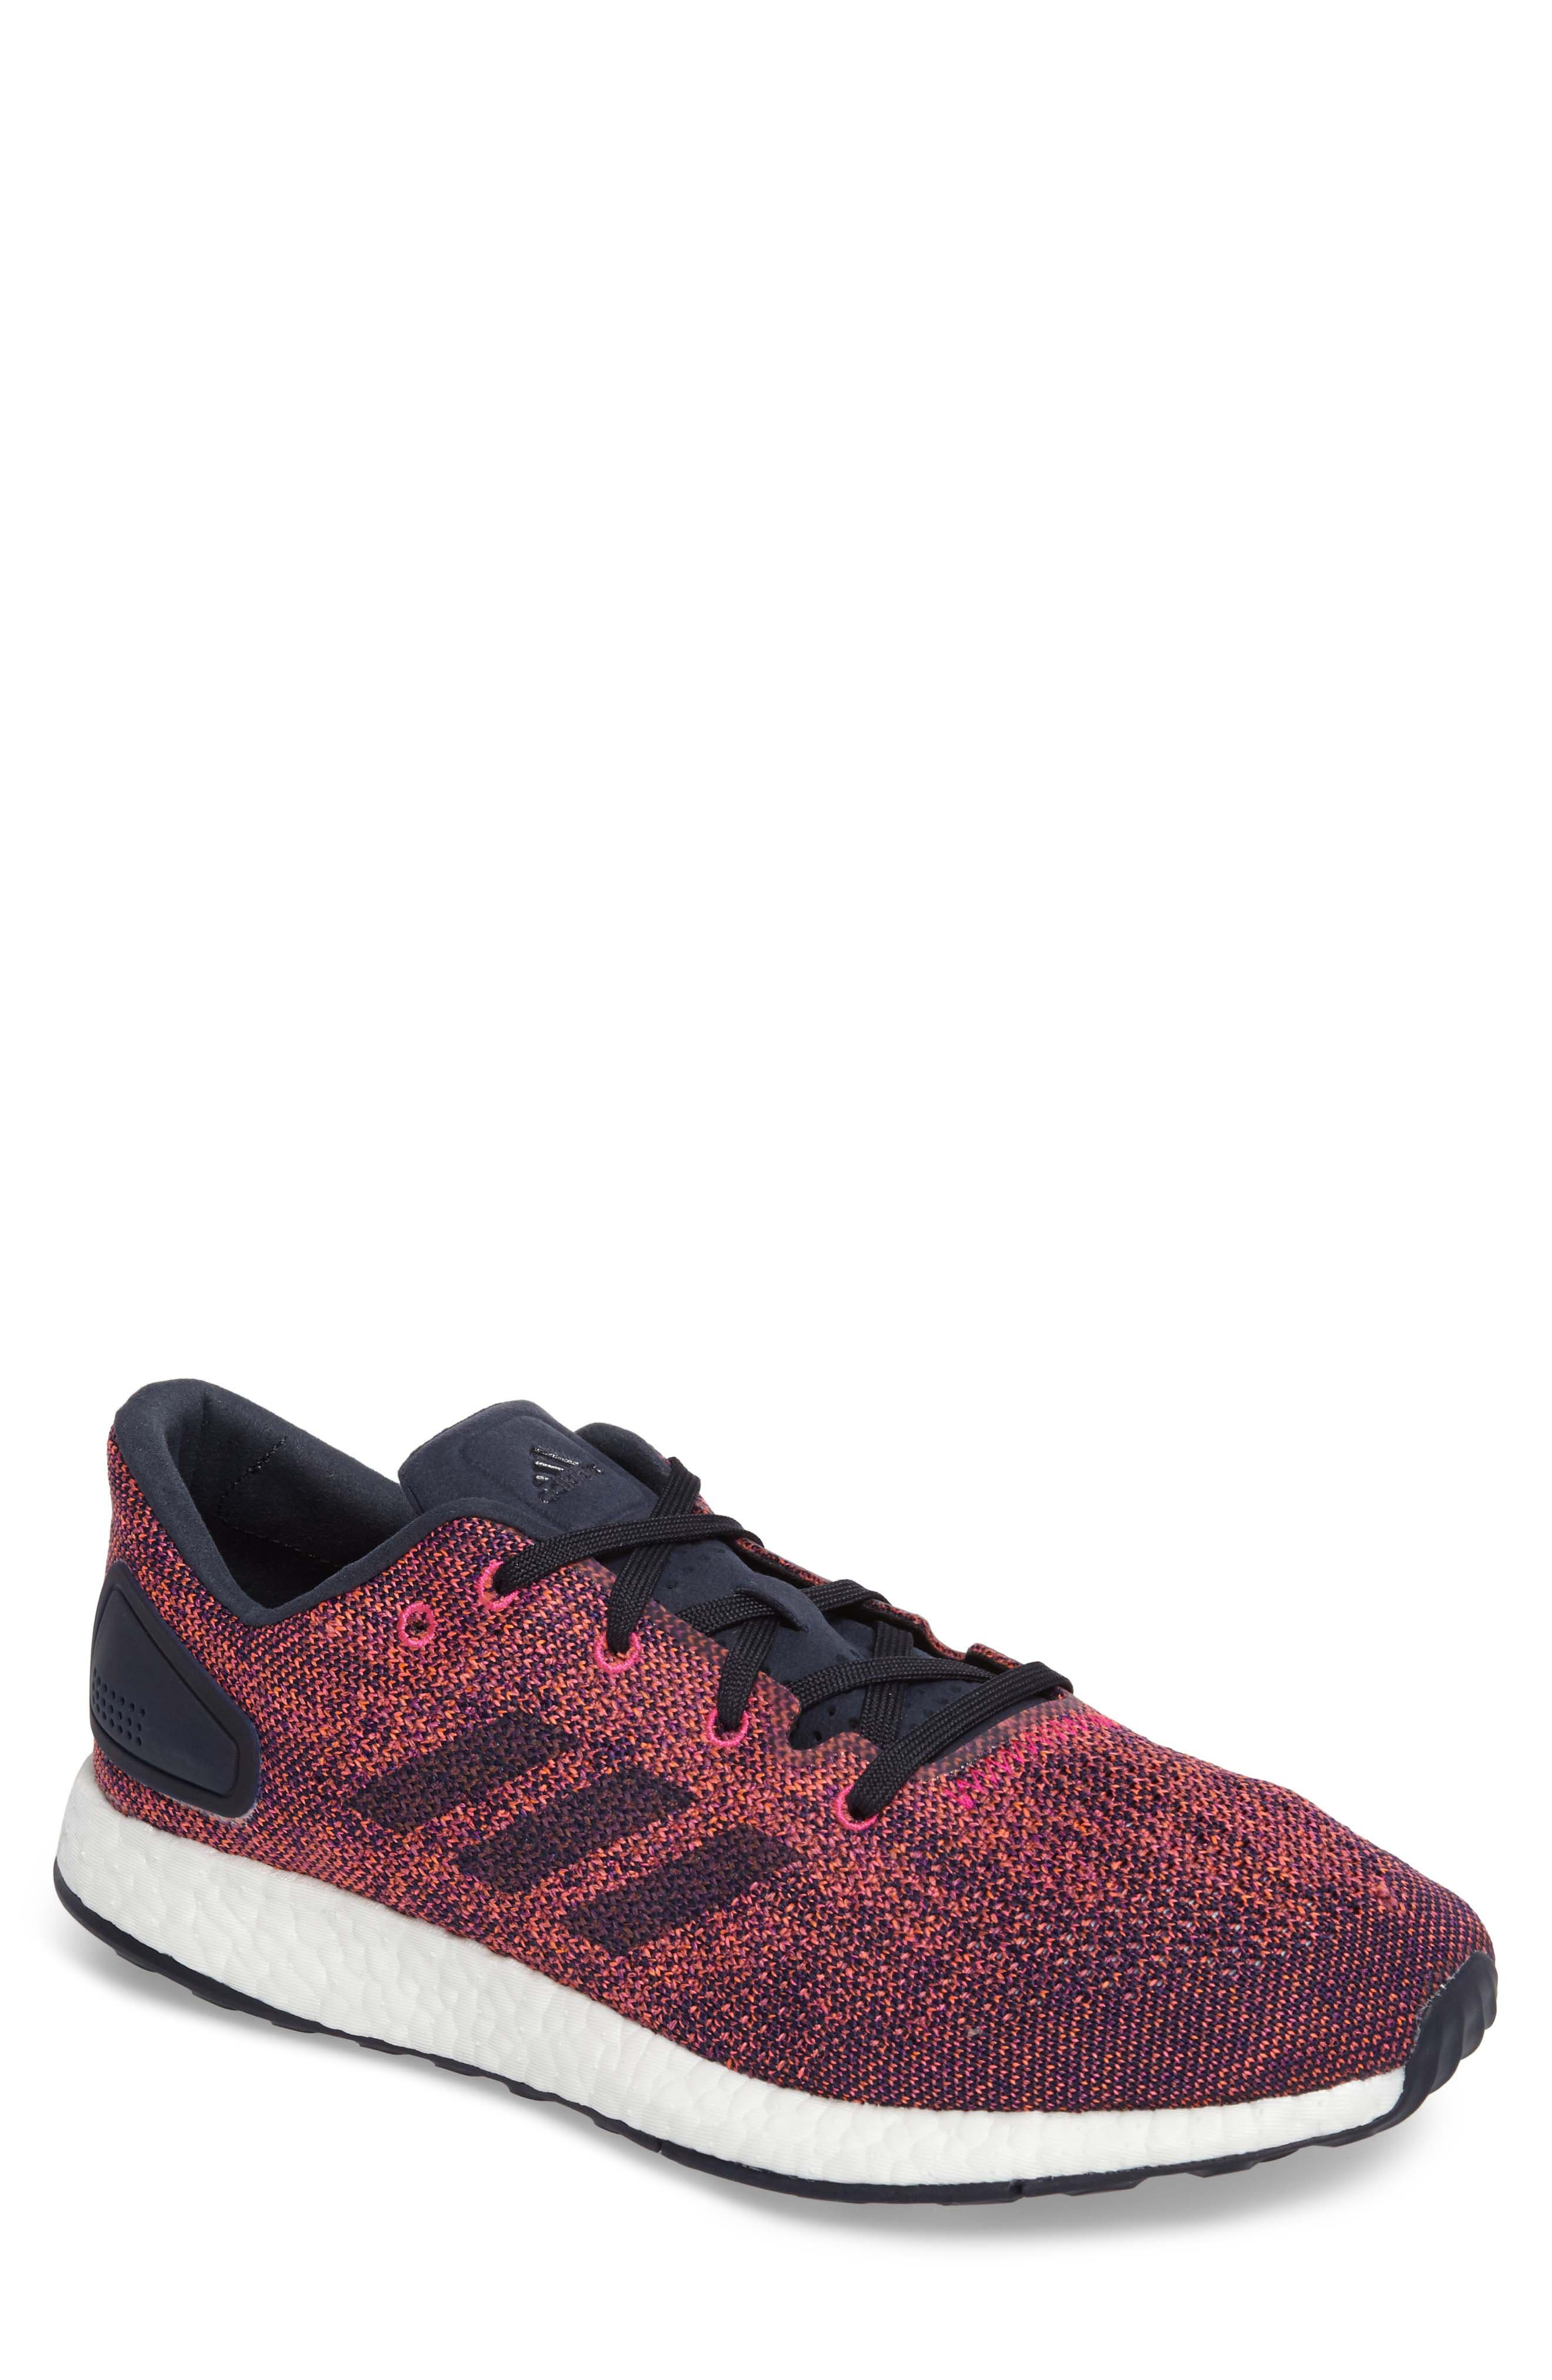 adidas Pureboost DPR LTD Running Shoe (Men)